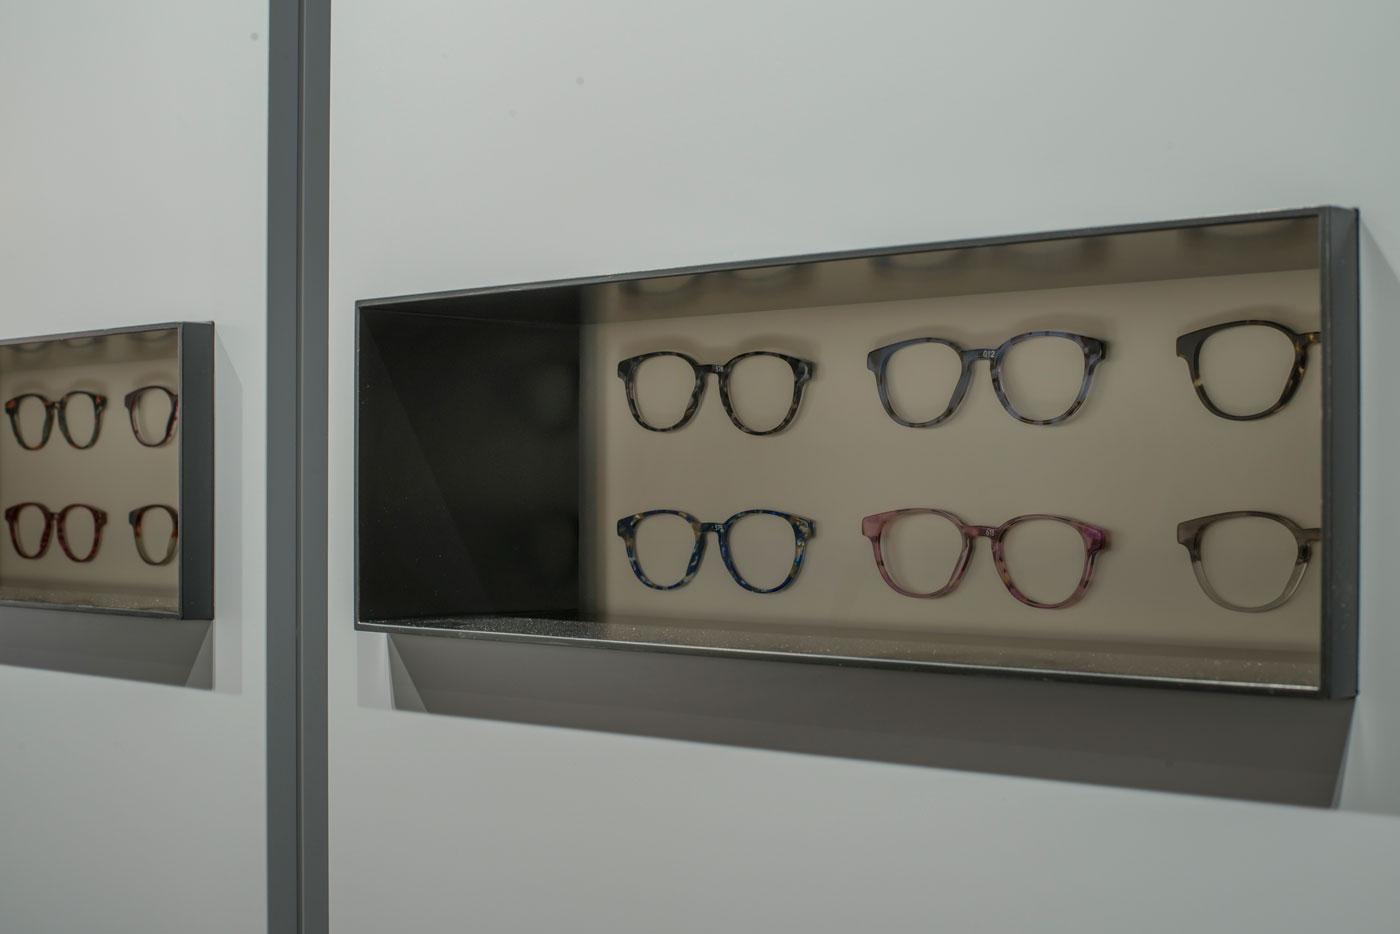 lab-centro-ottico-emmedue-spoleto-6